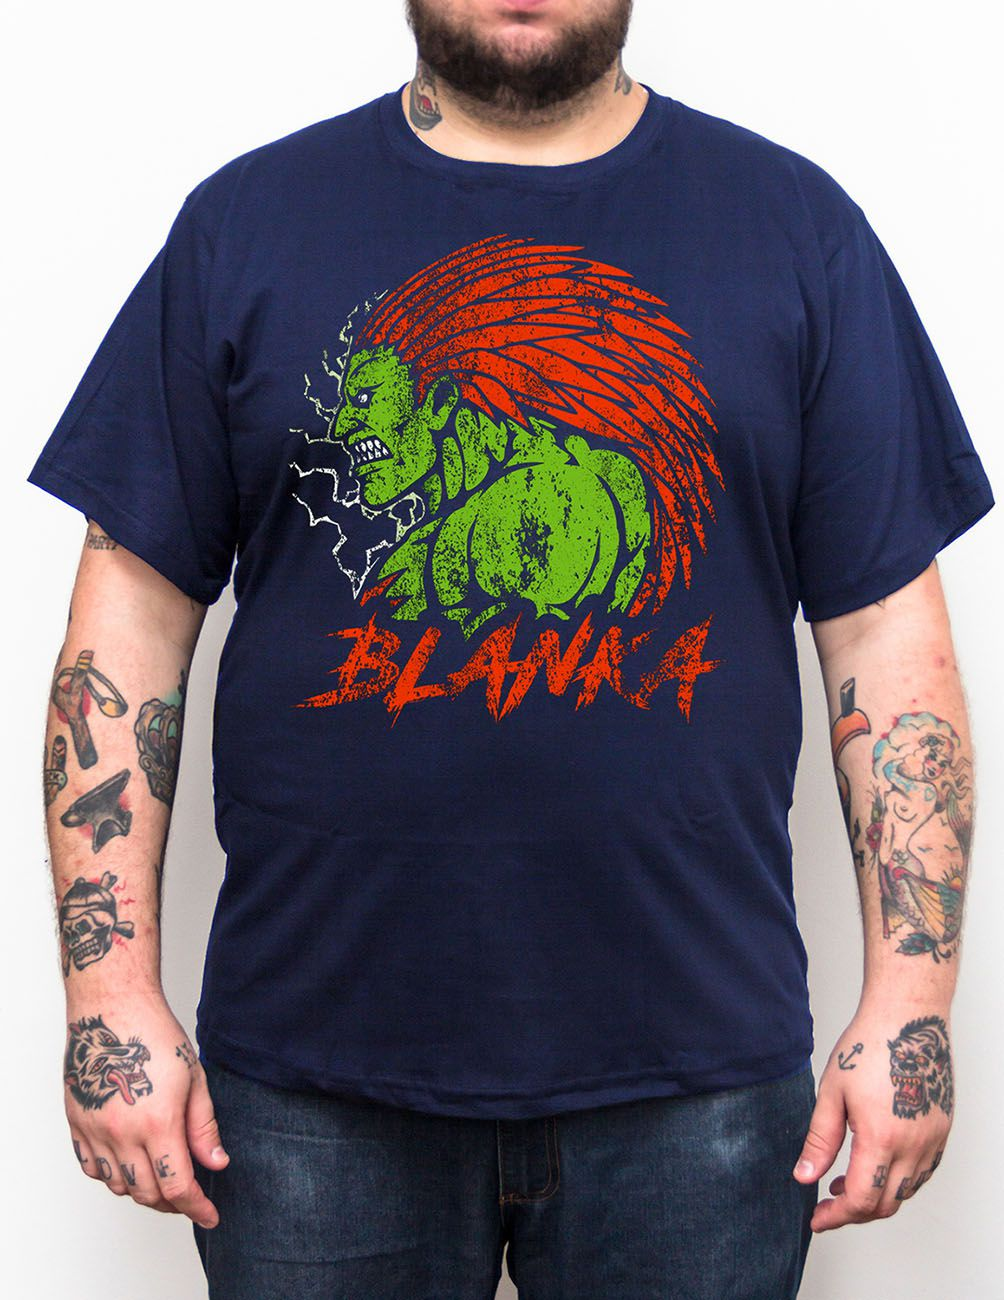 Camiseta Blanka Street Fighter - Tamanho Grande Xg  - HShop